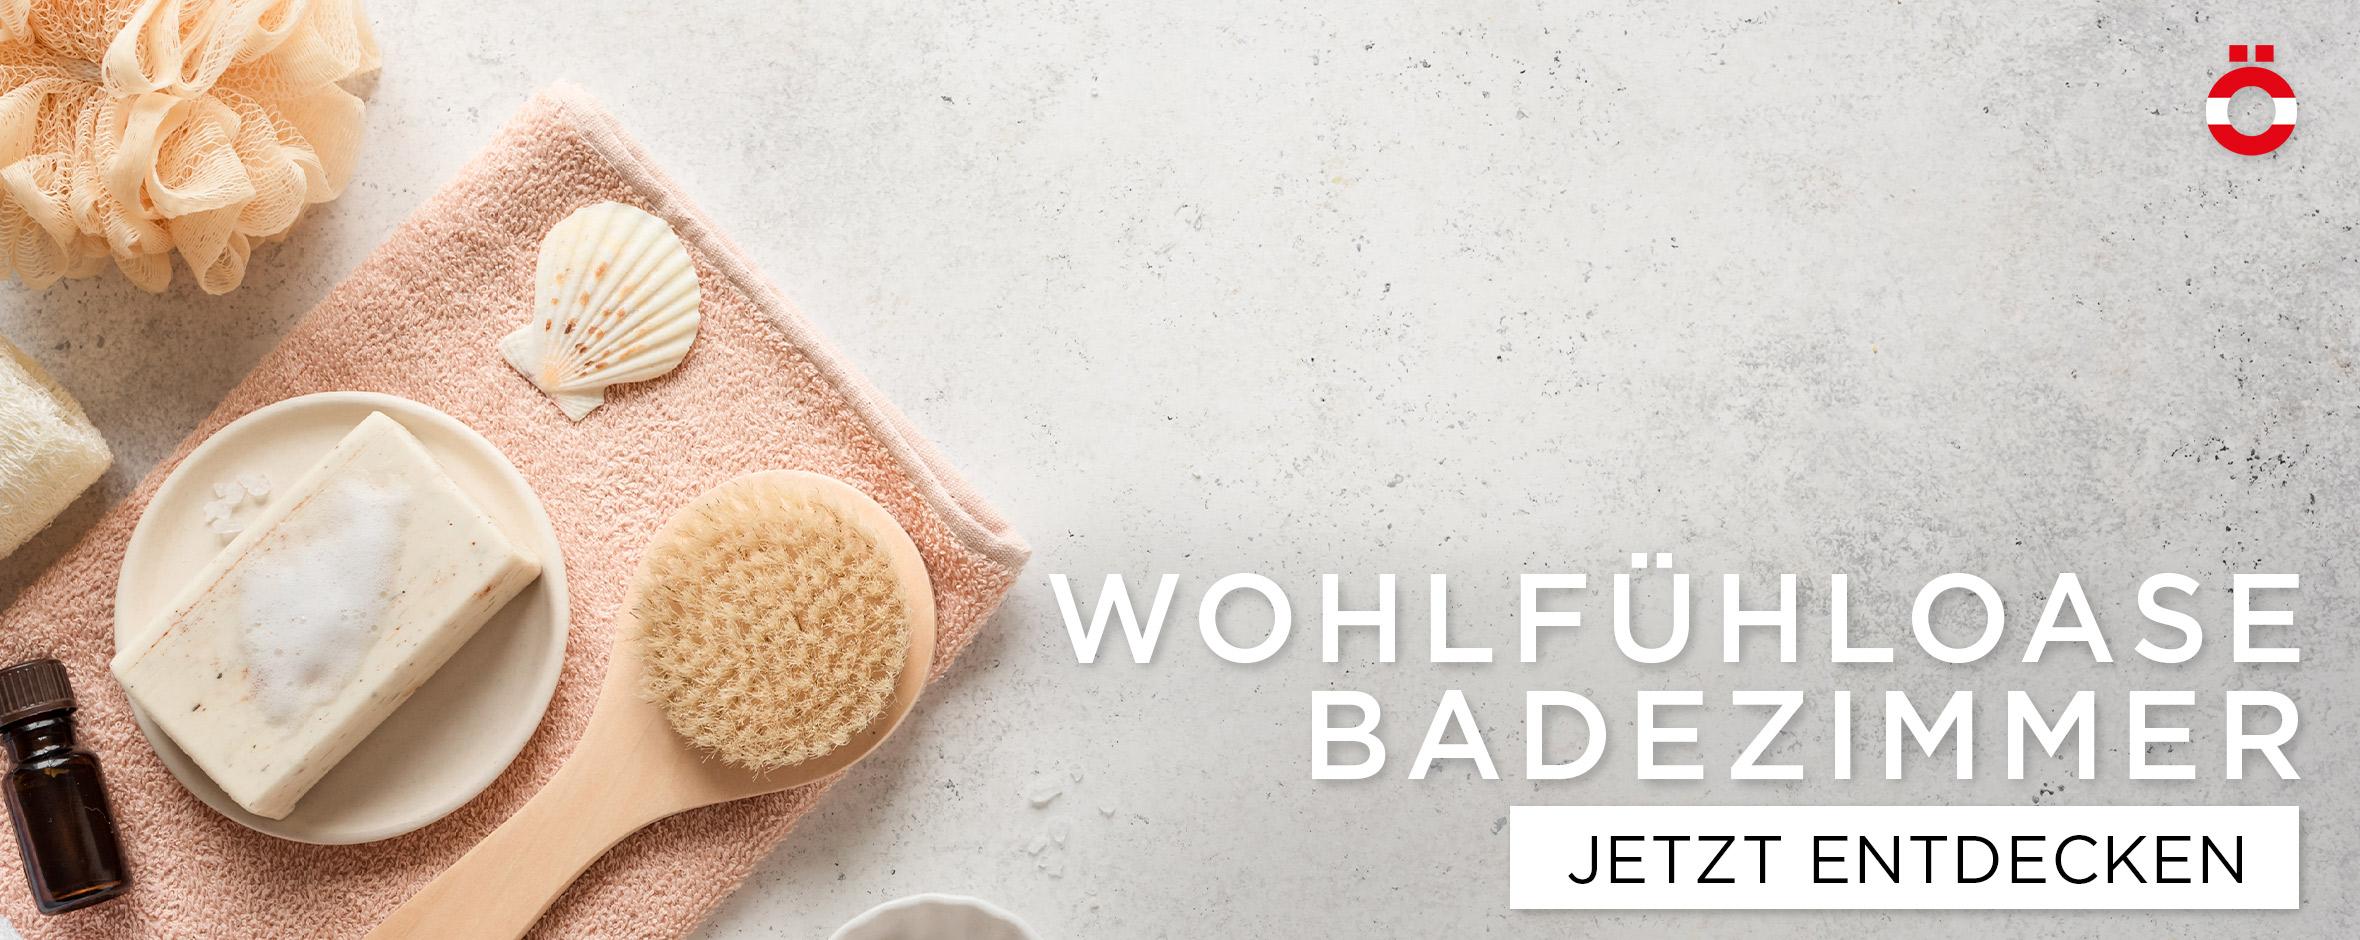 Wohlfühloase Badezimmer - shöpping.at